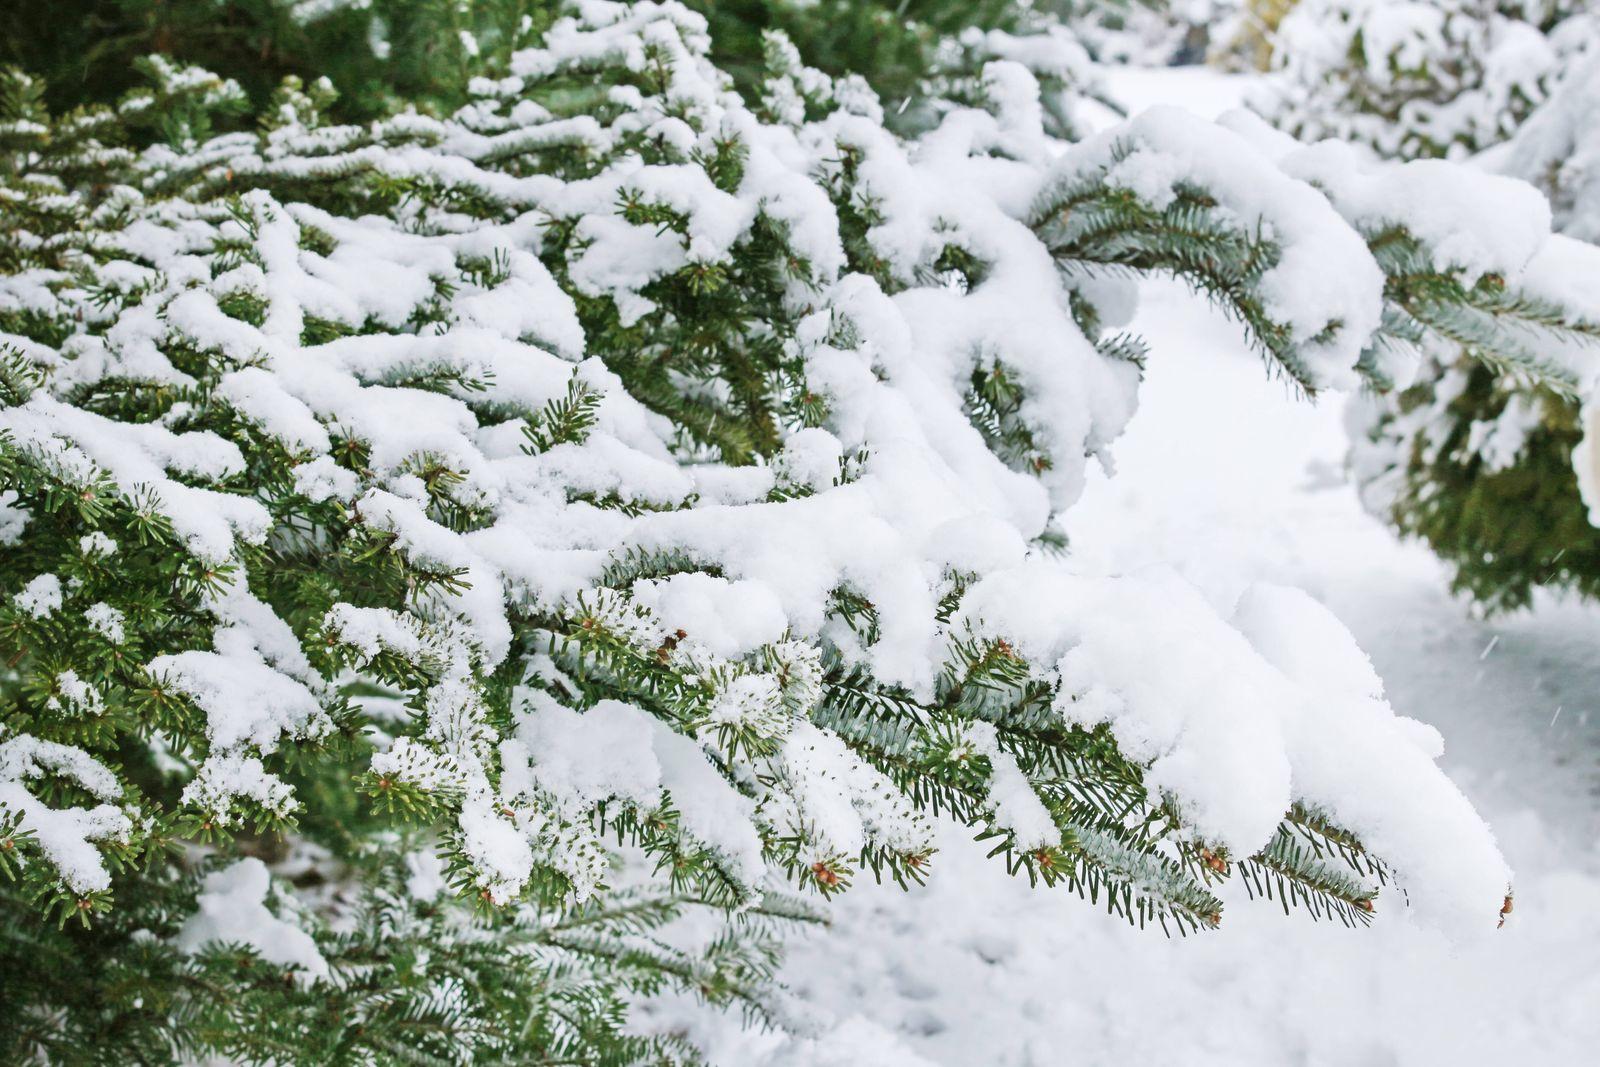 Fir branches under snow. Garden in winter PUBLICATIONxINxGERxSUIxAUTxONLY BEW1D90E461